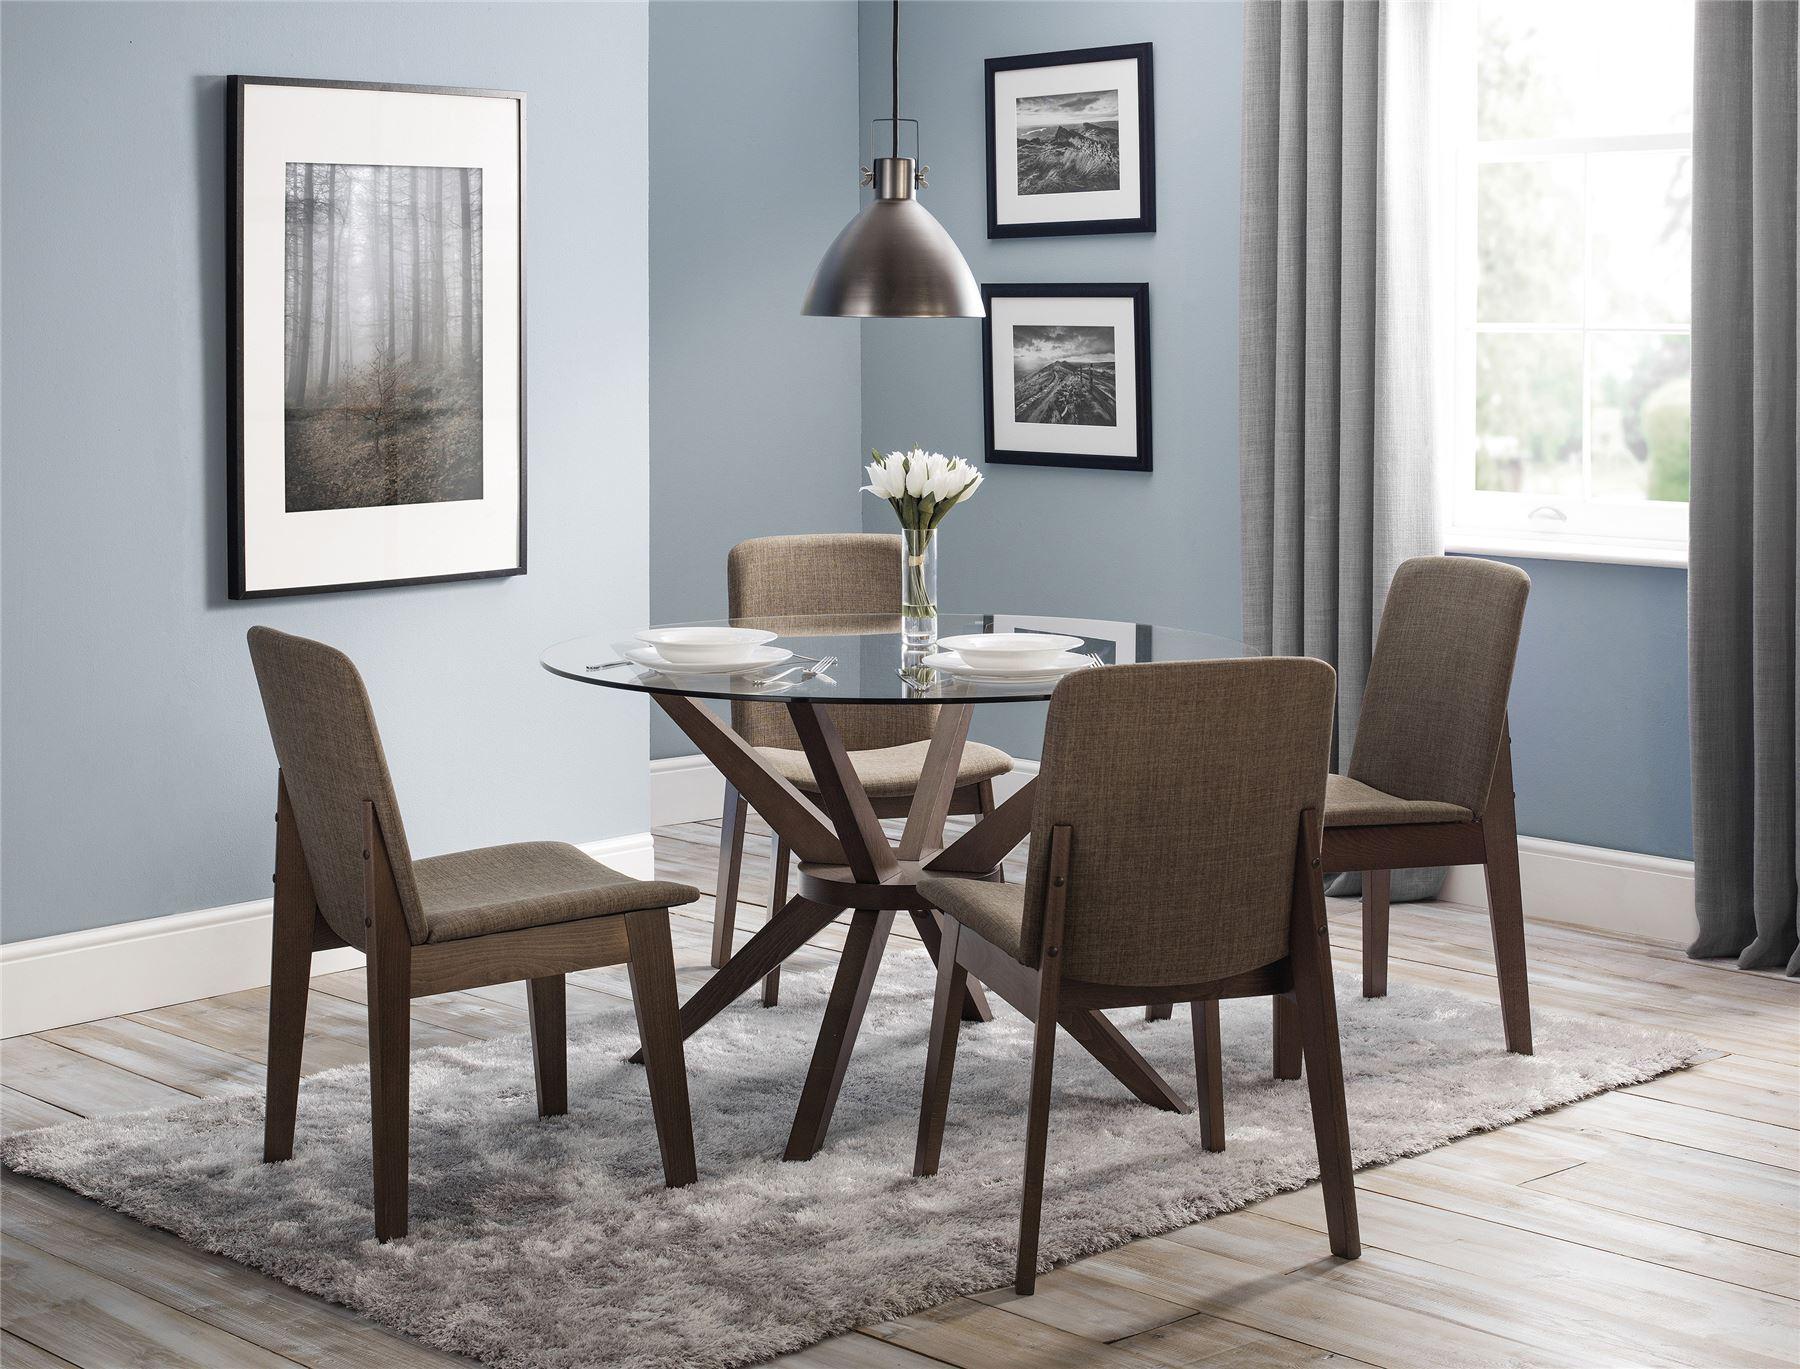 Julian bowen chelsea round dining table glass walnut finish 4 kensington chairs